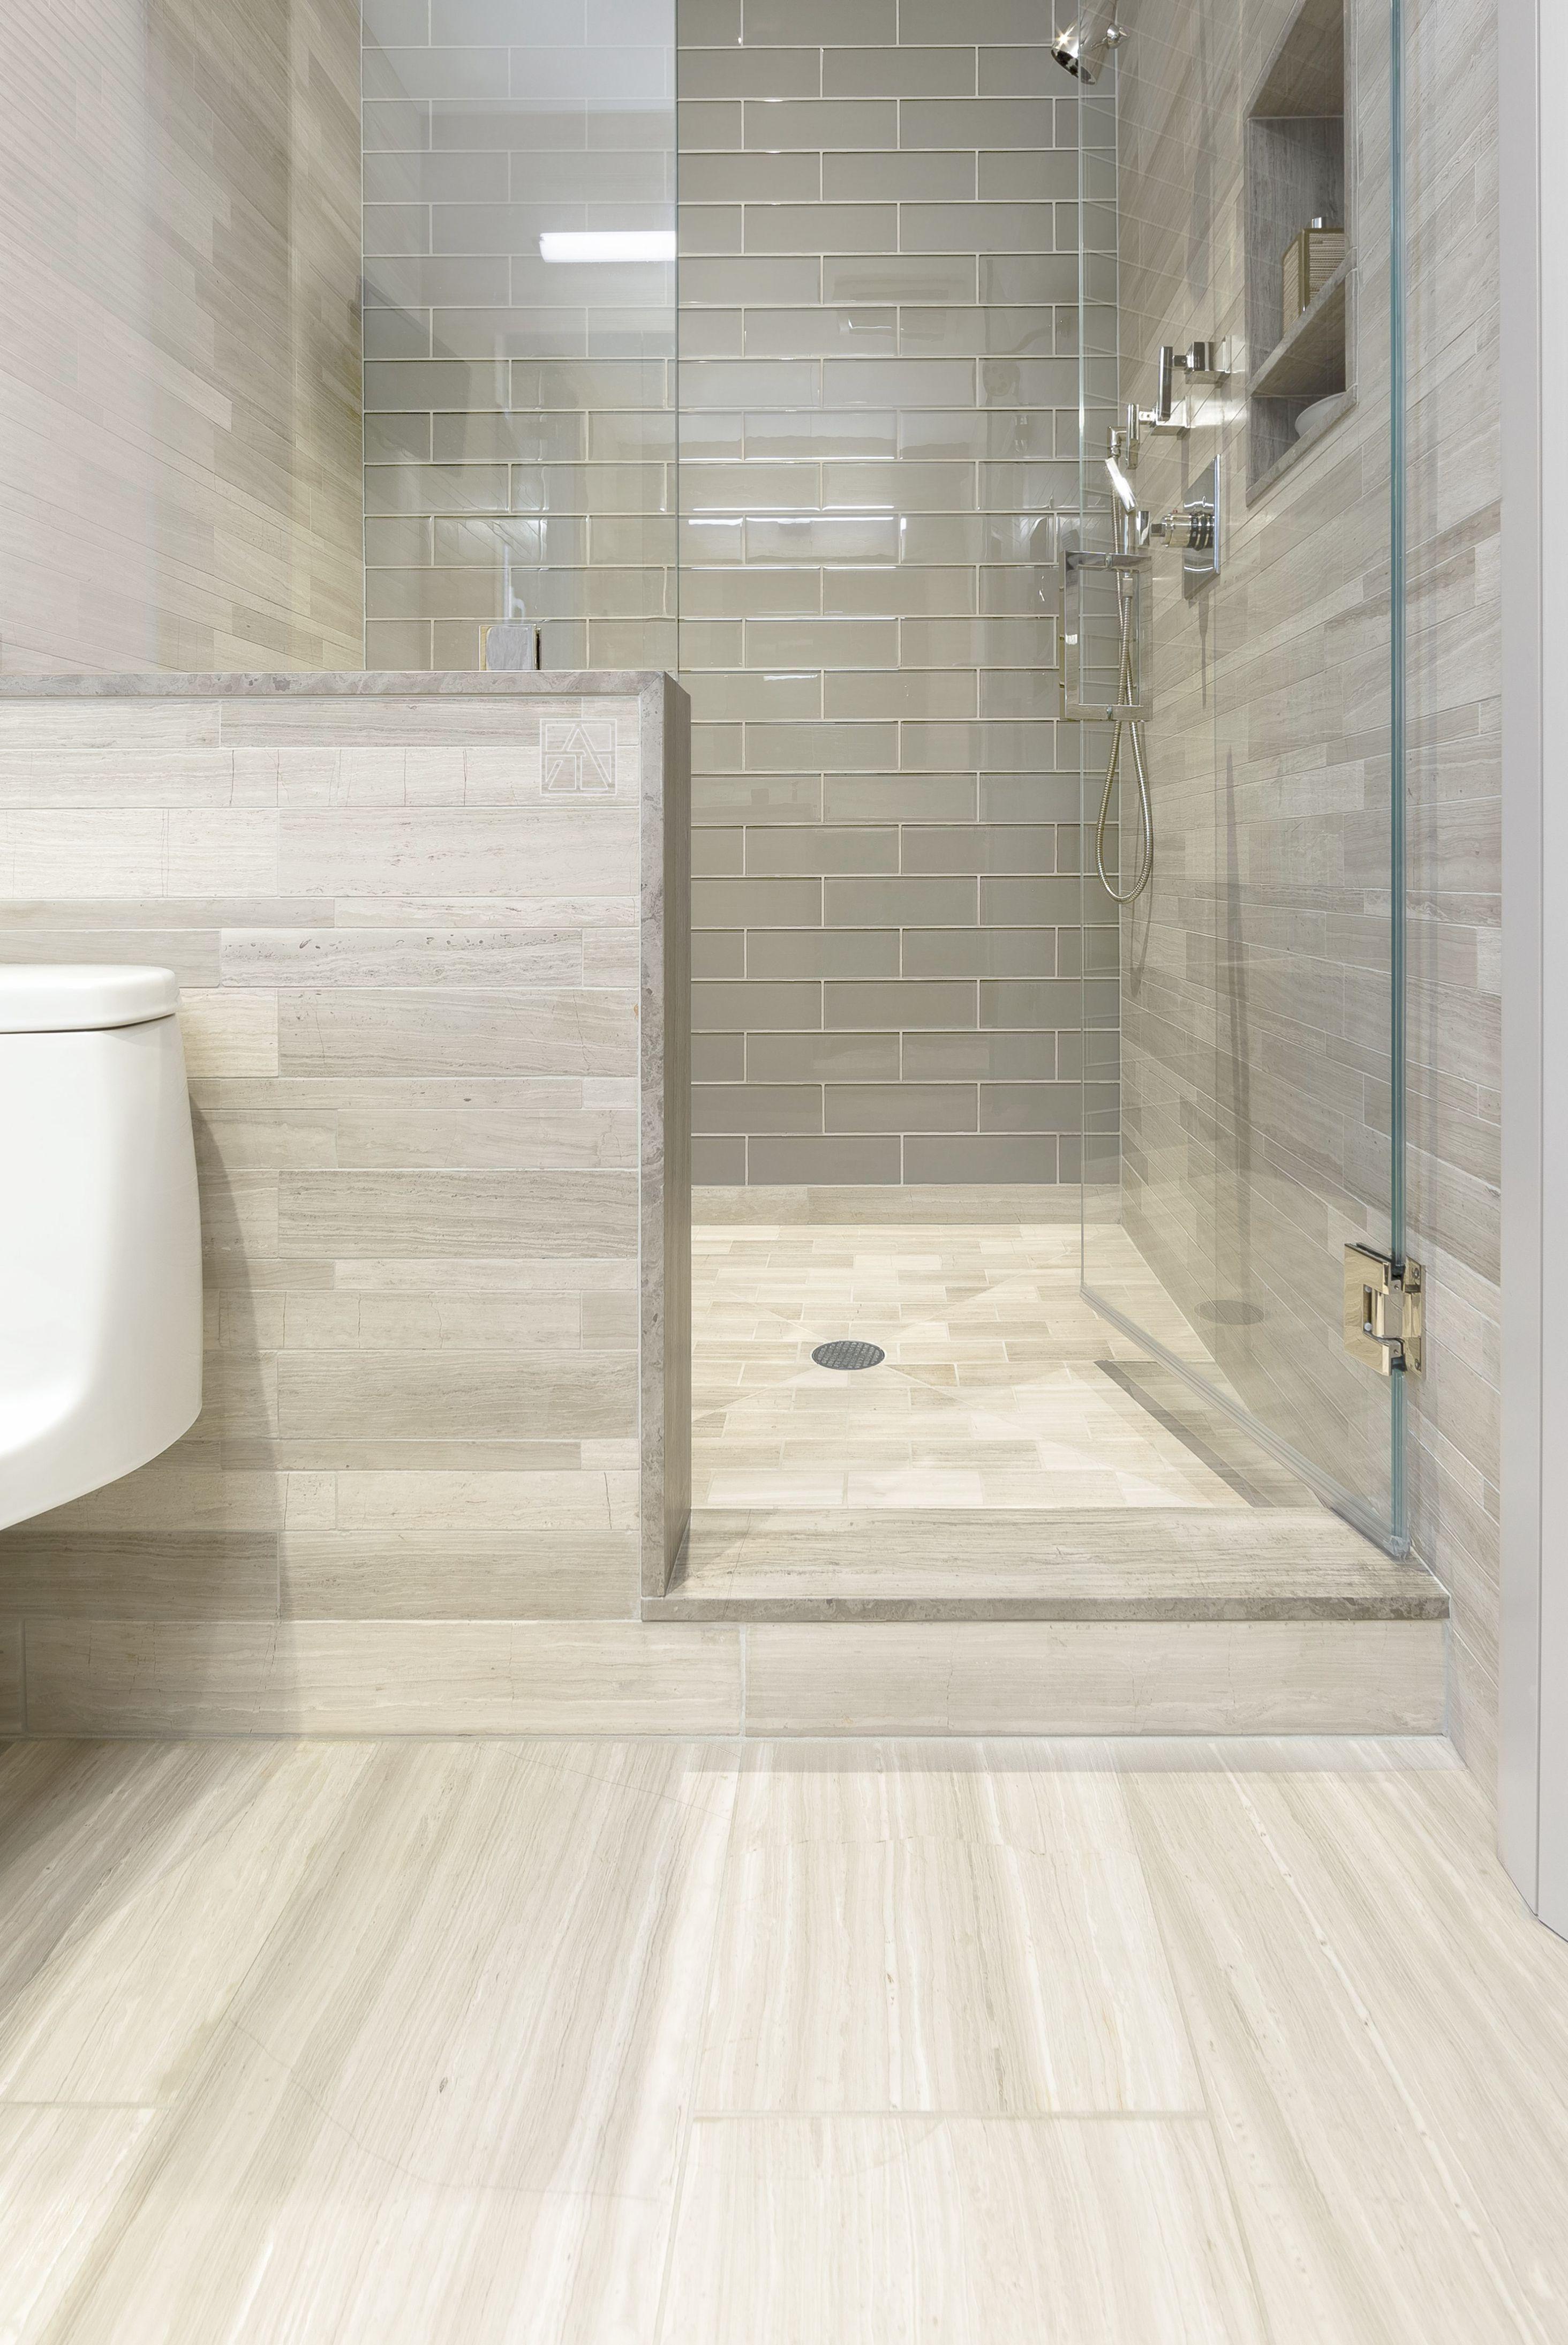 Bathroom Shower Curtain Ideas Pinterest Per Bathroom Light Fixtures Single Along With Bathroom Bathroom Redesign Bathroom Tile Designs Bathroom Remodel Shower